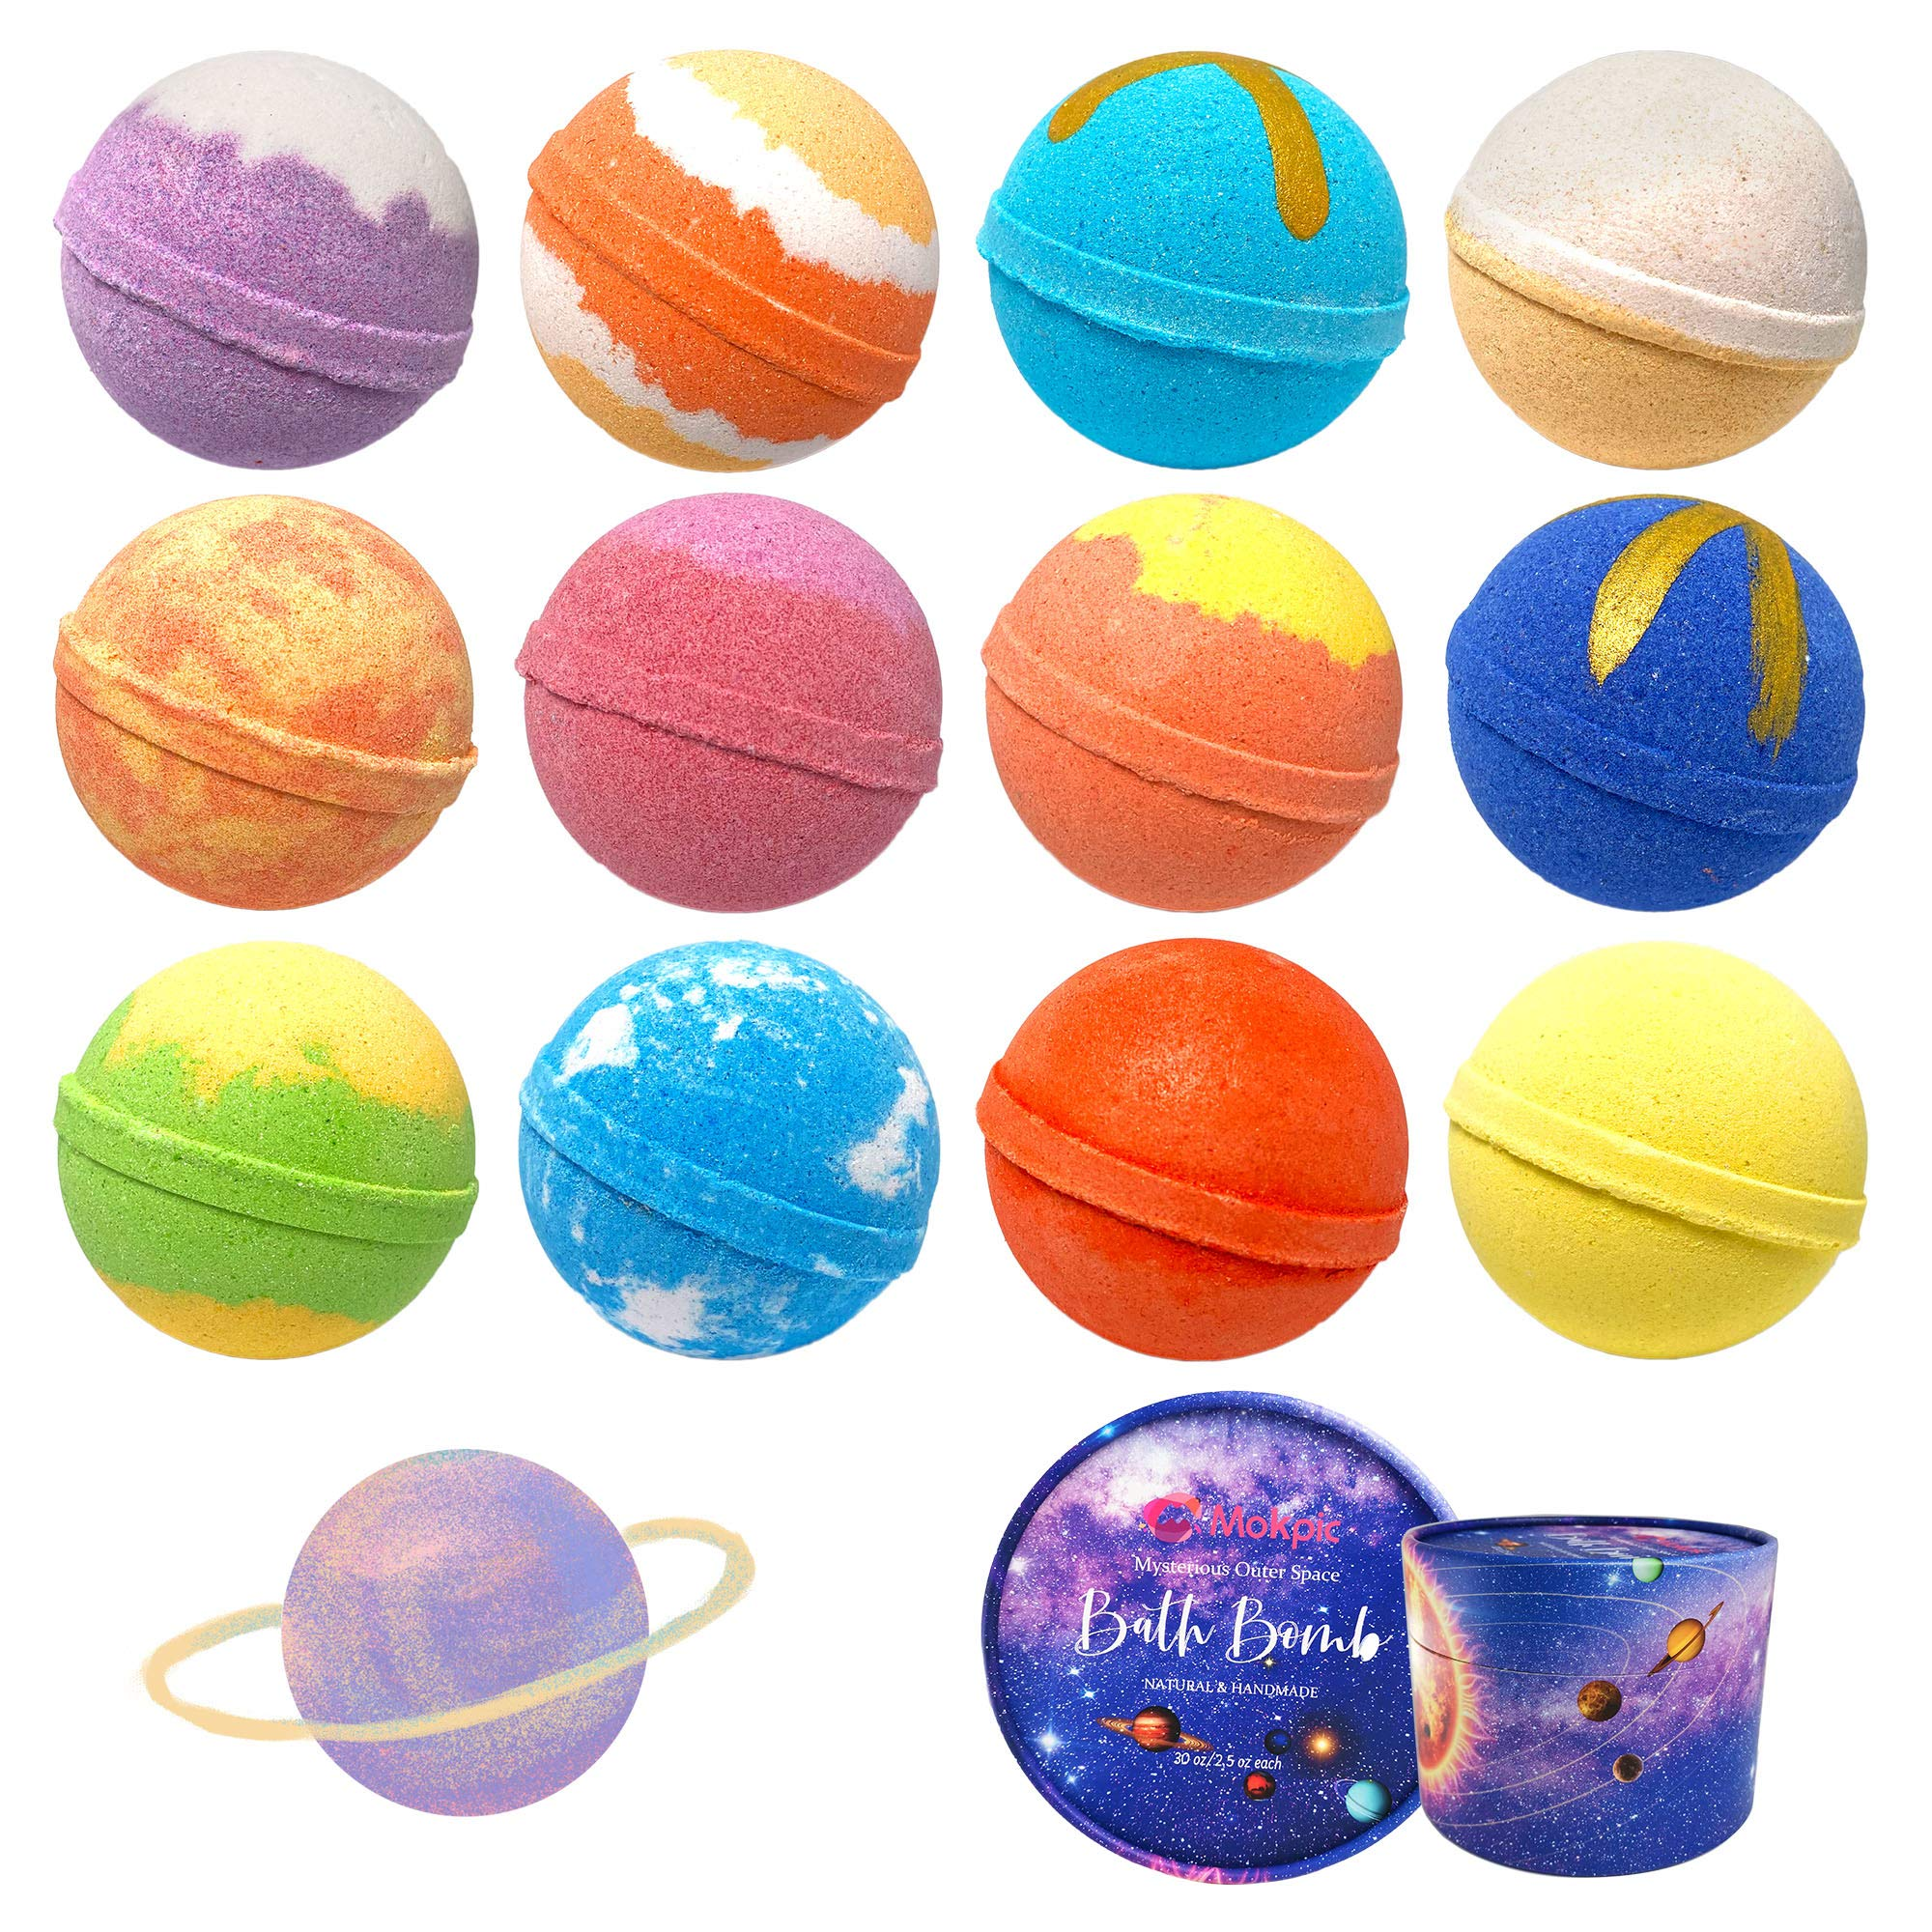 MOKPIC Bath Bombs 12 Pack Solar System Planets Bath Bomb Gift Set